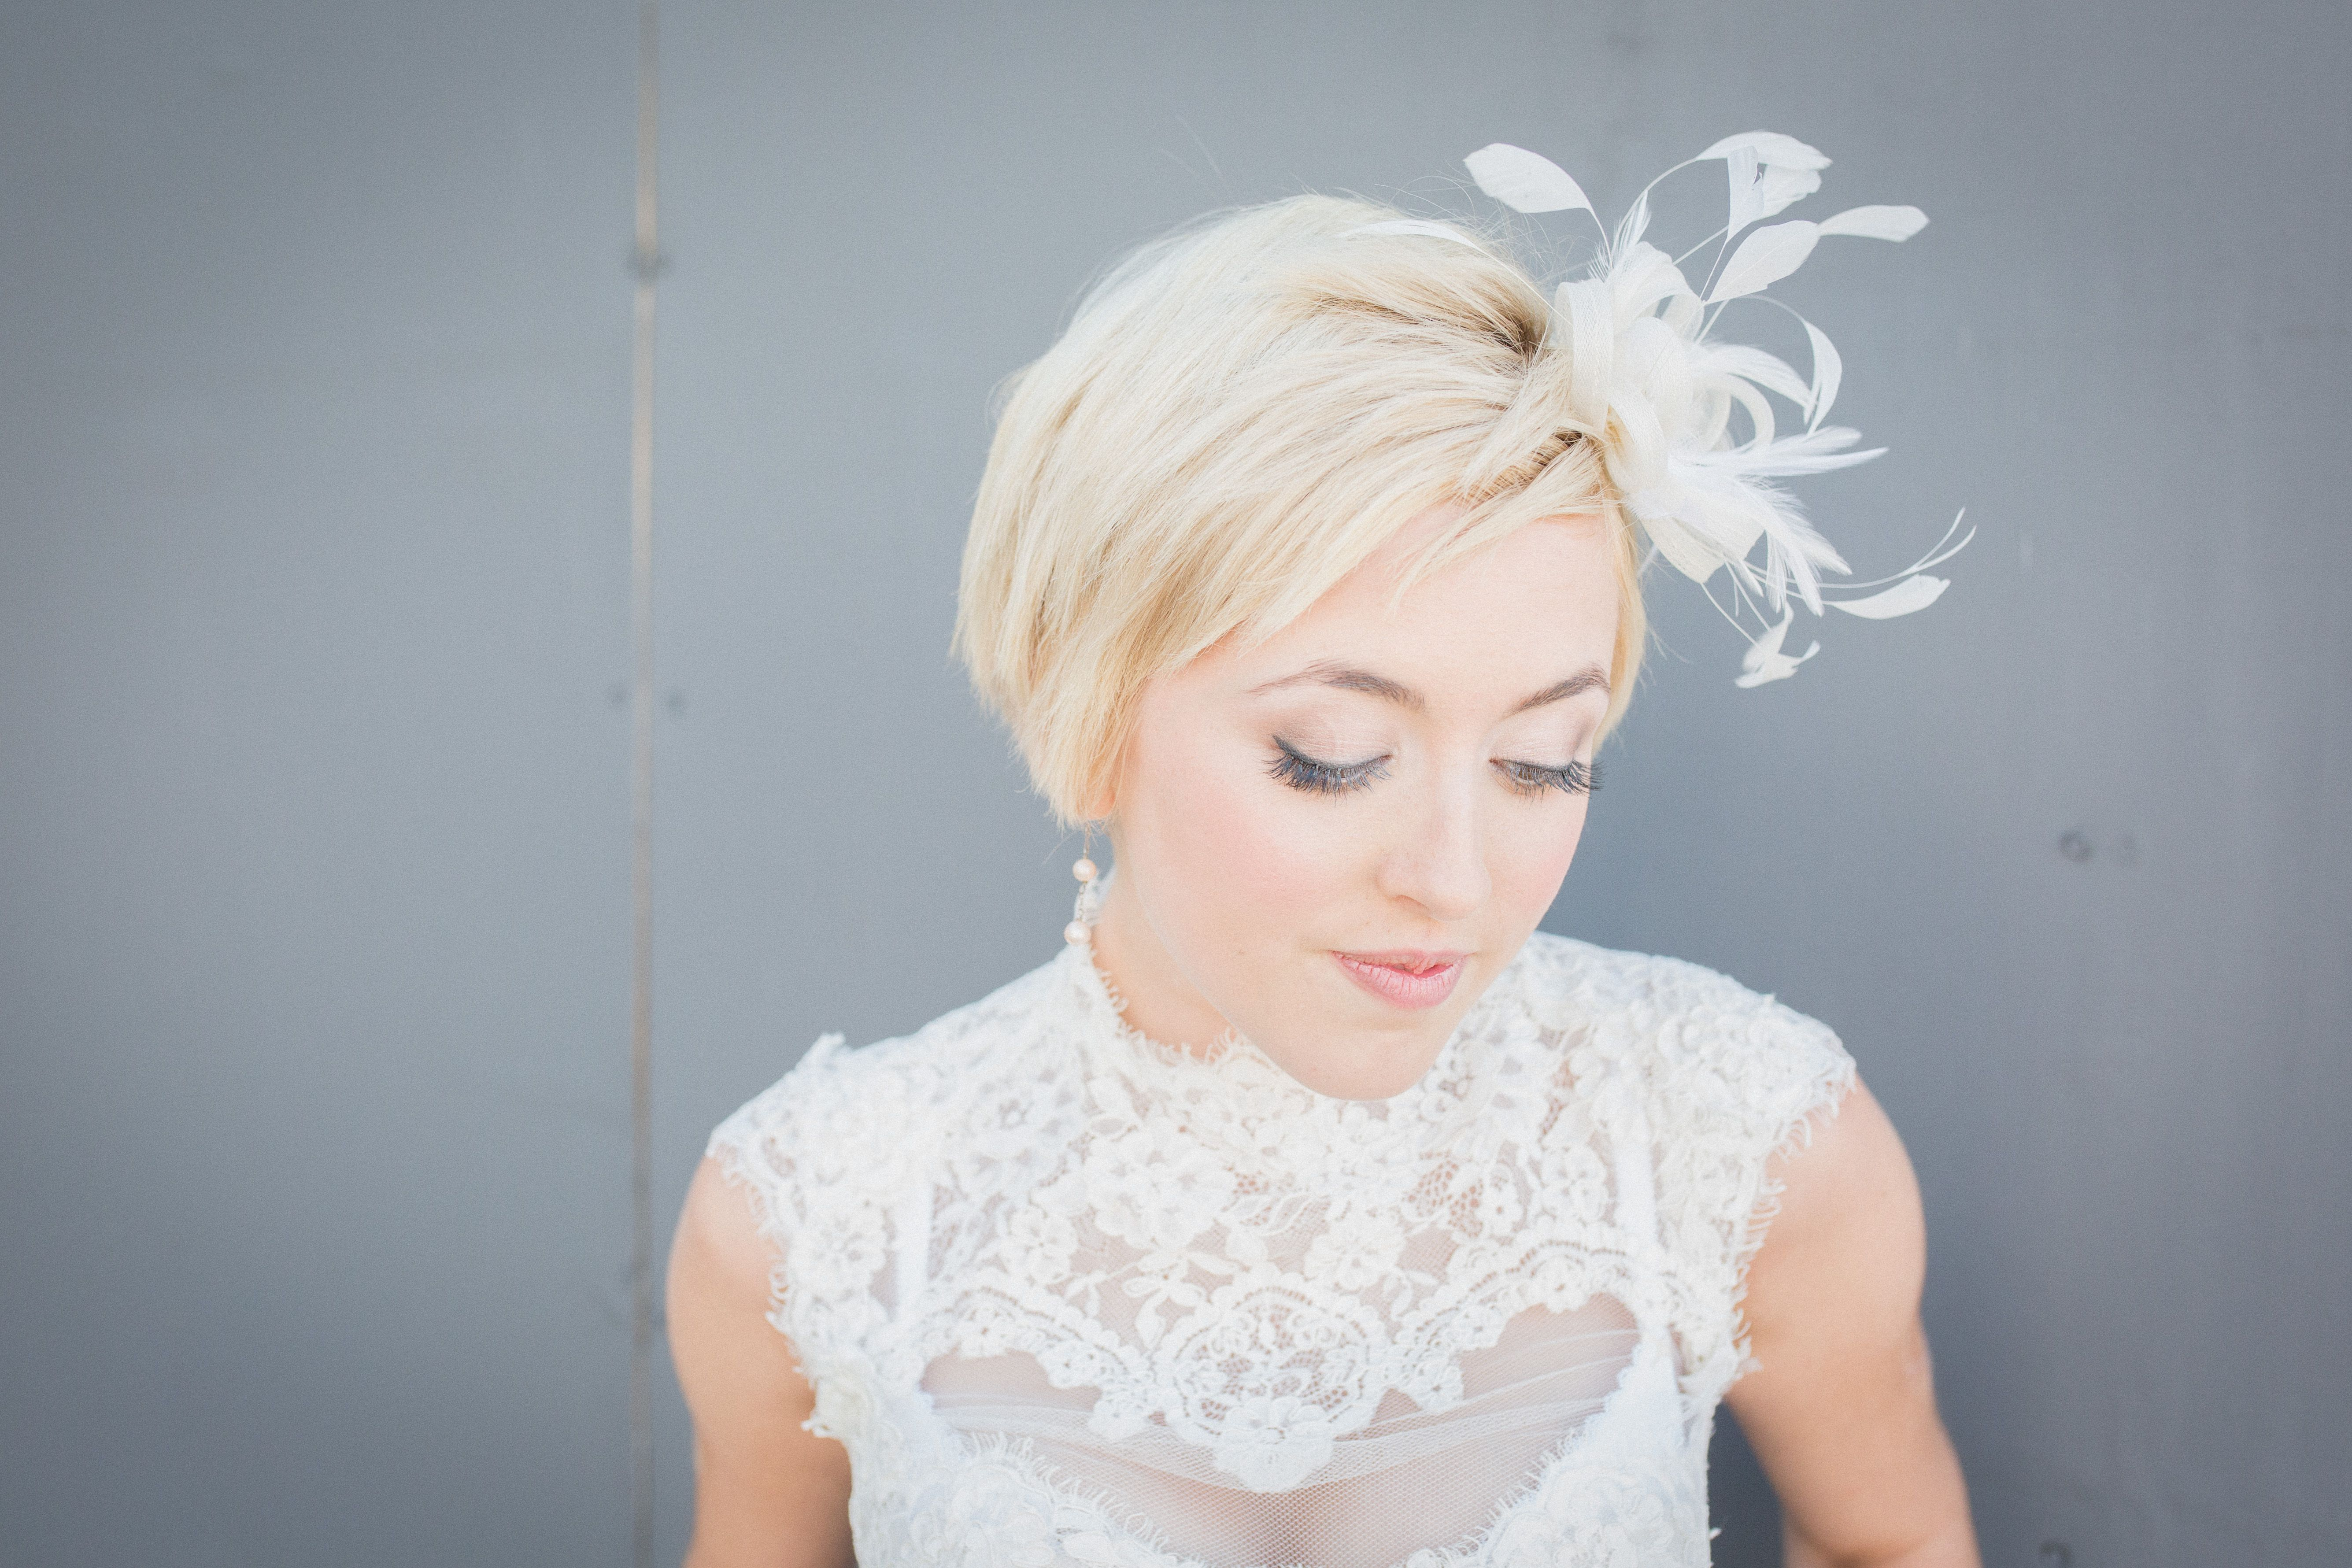 bridal hair & makeup @bristol planetarium photoshoot june15